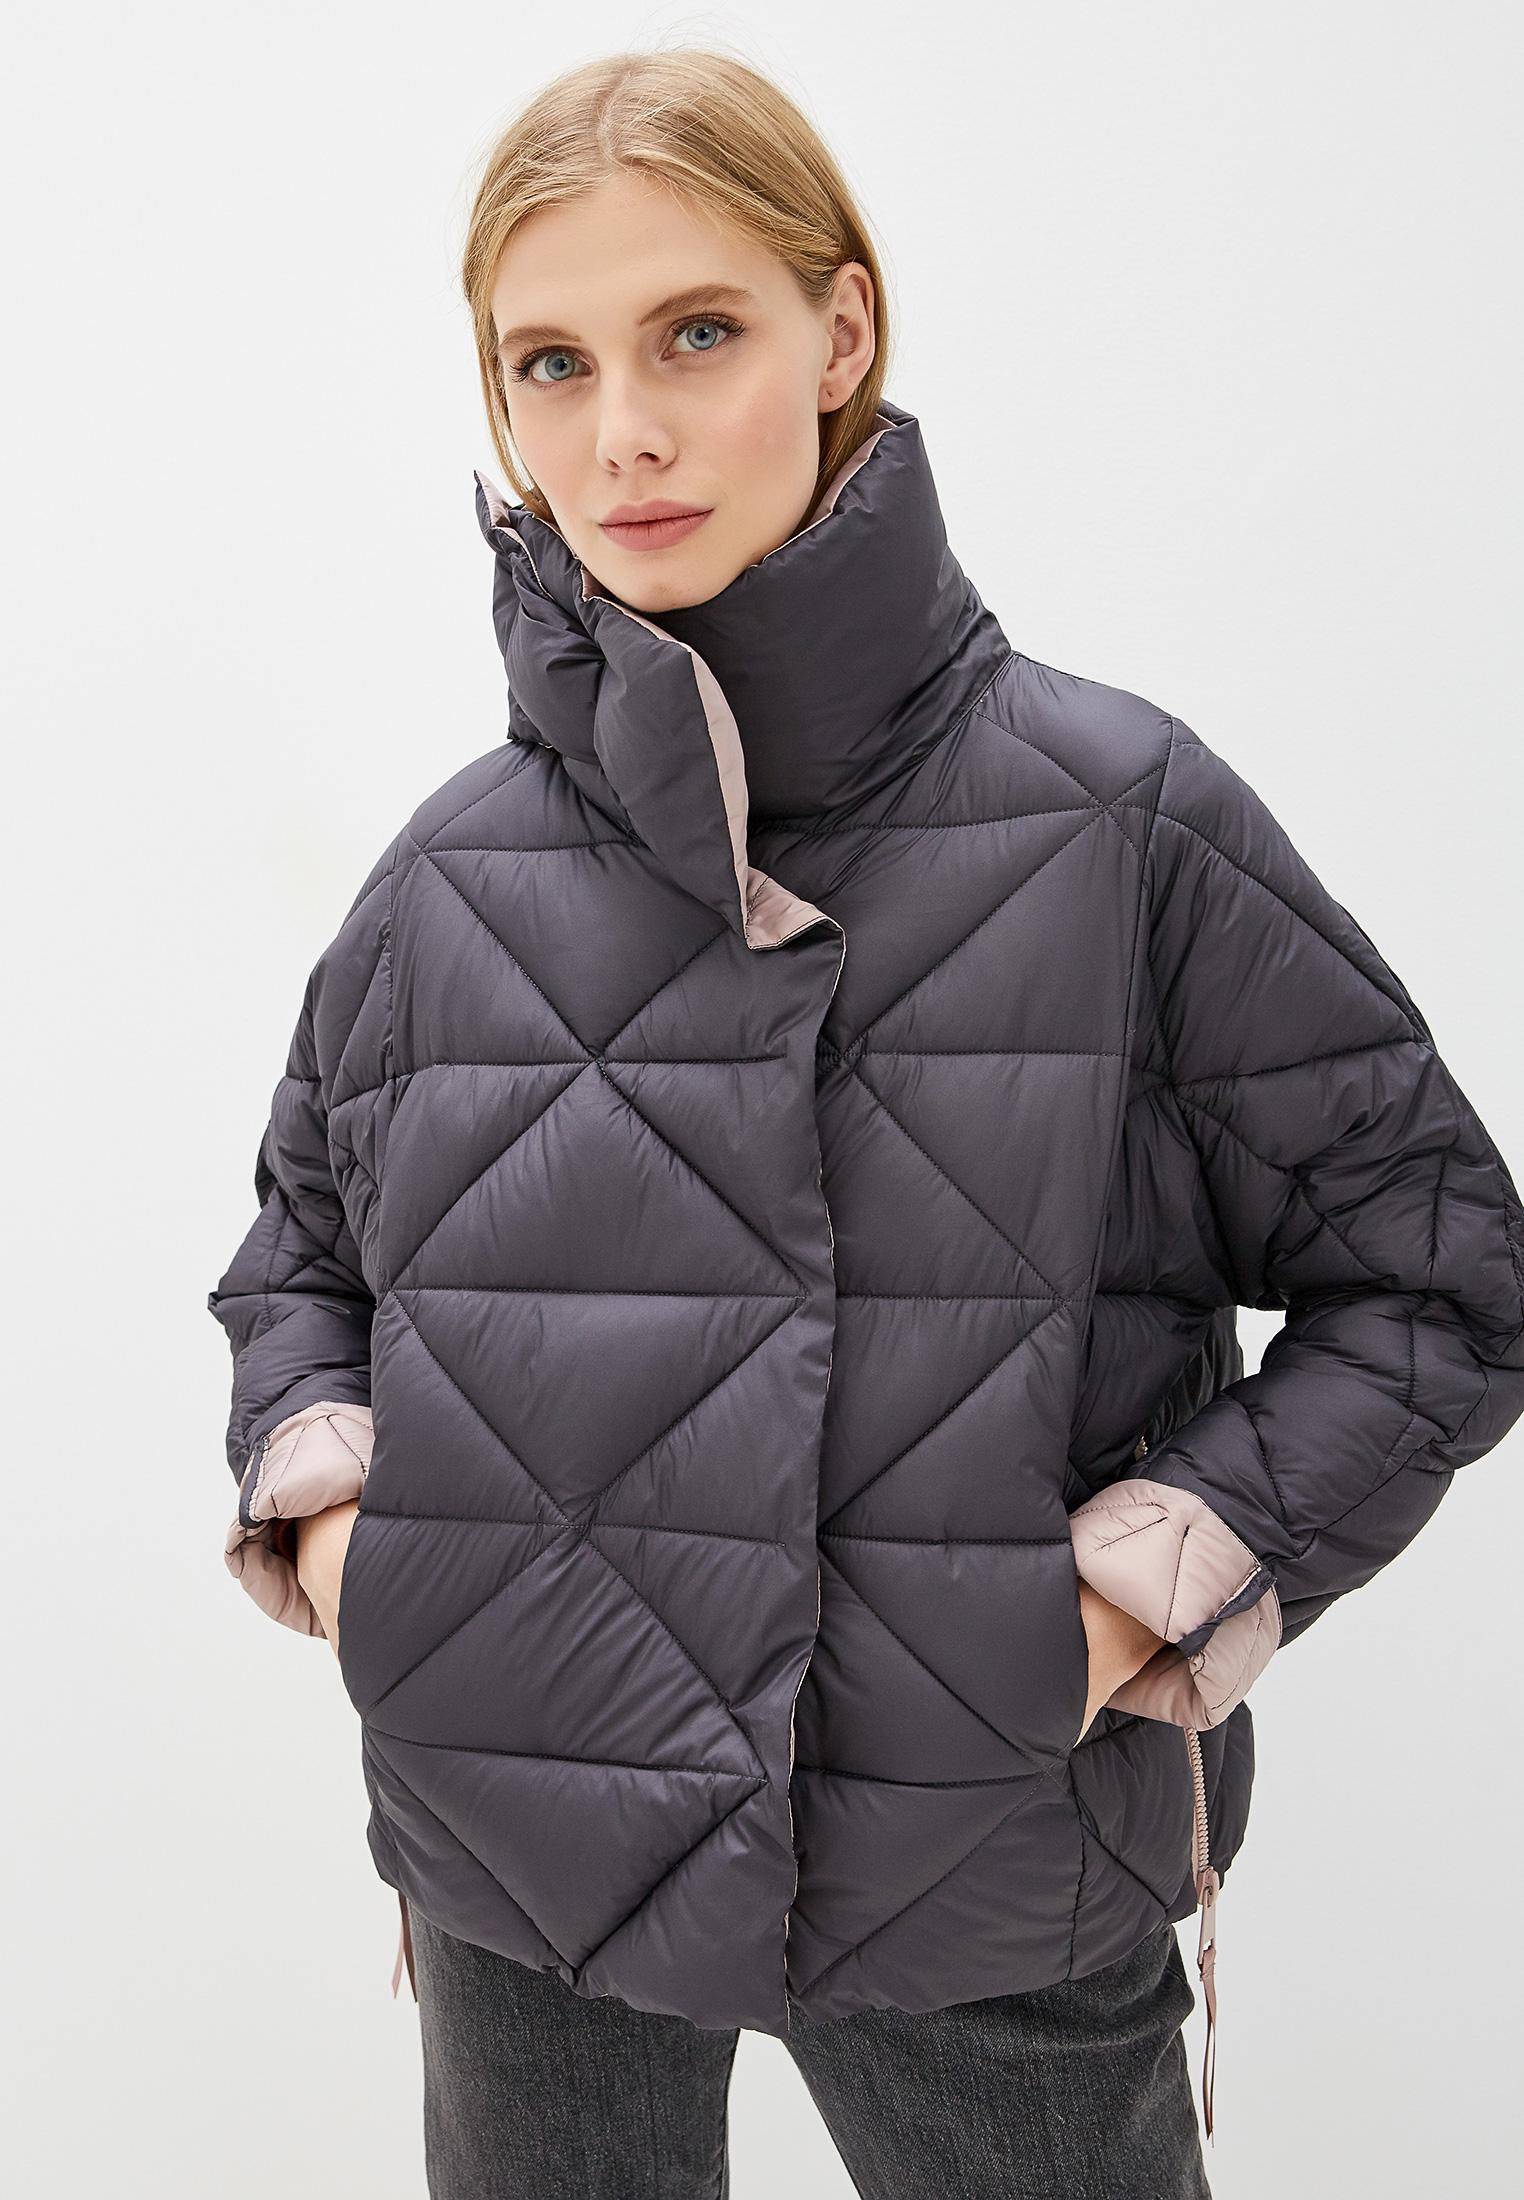 Куртка утепленная, Savage, цвет: серый. Артикул: SA004EWGESD4. Одежда / Верхняя одежда / Пуховики и зимние куртки